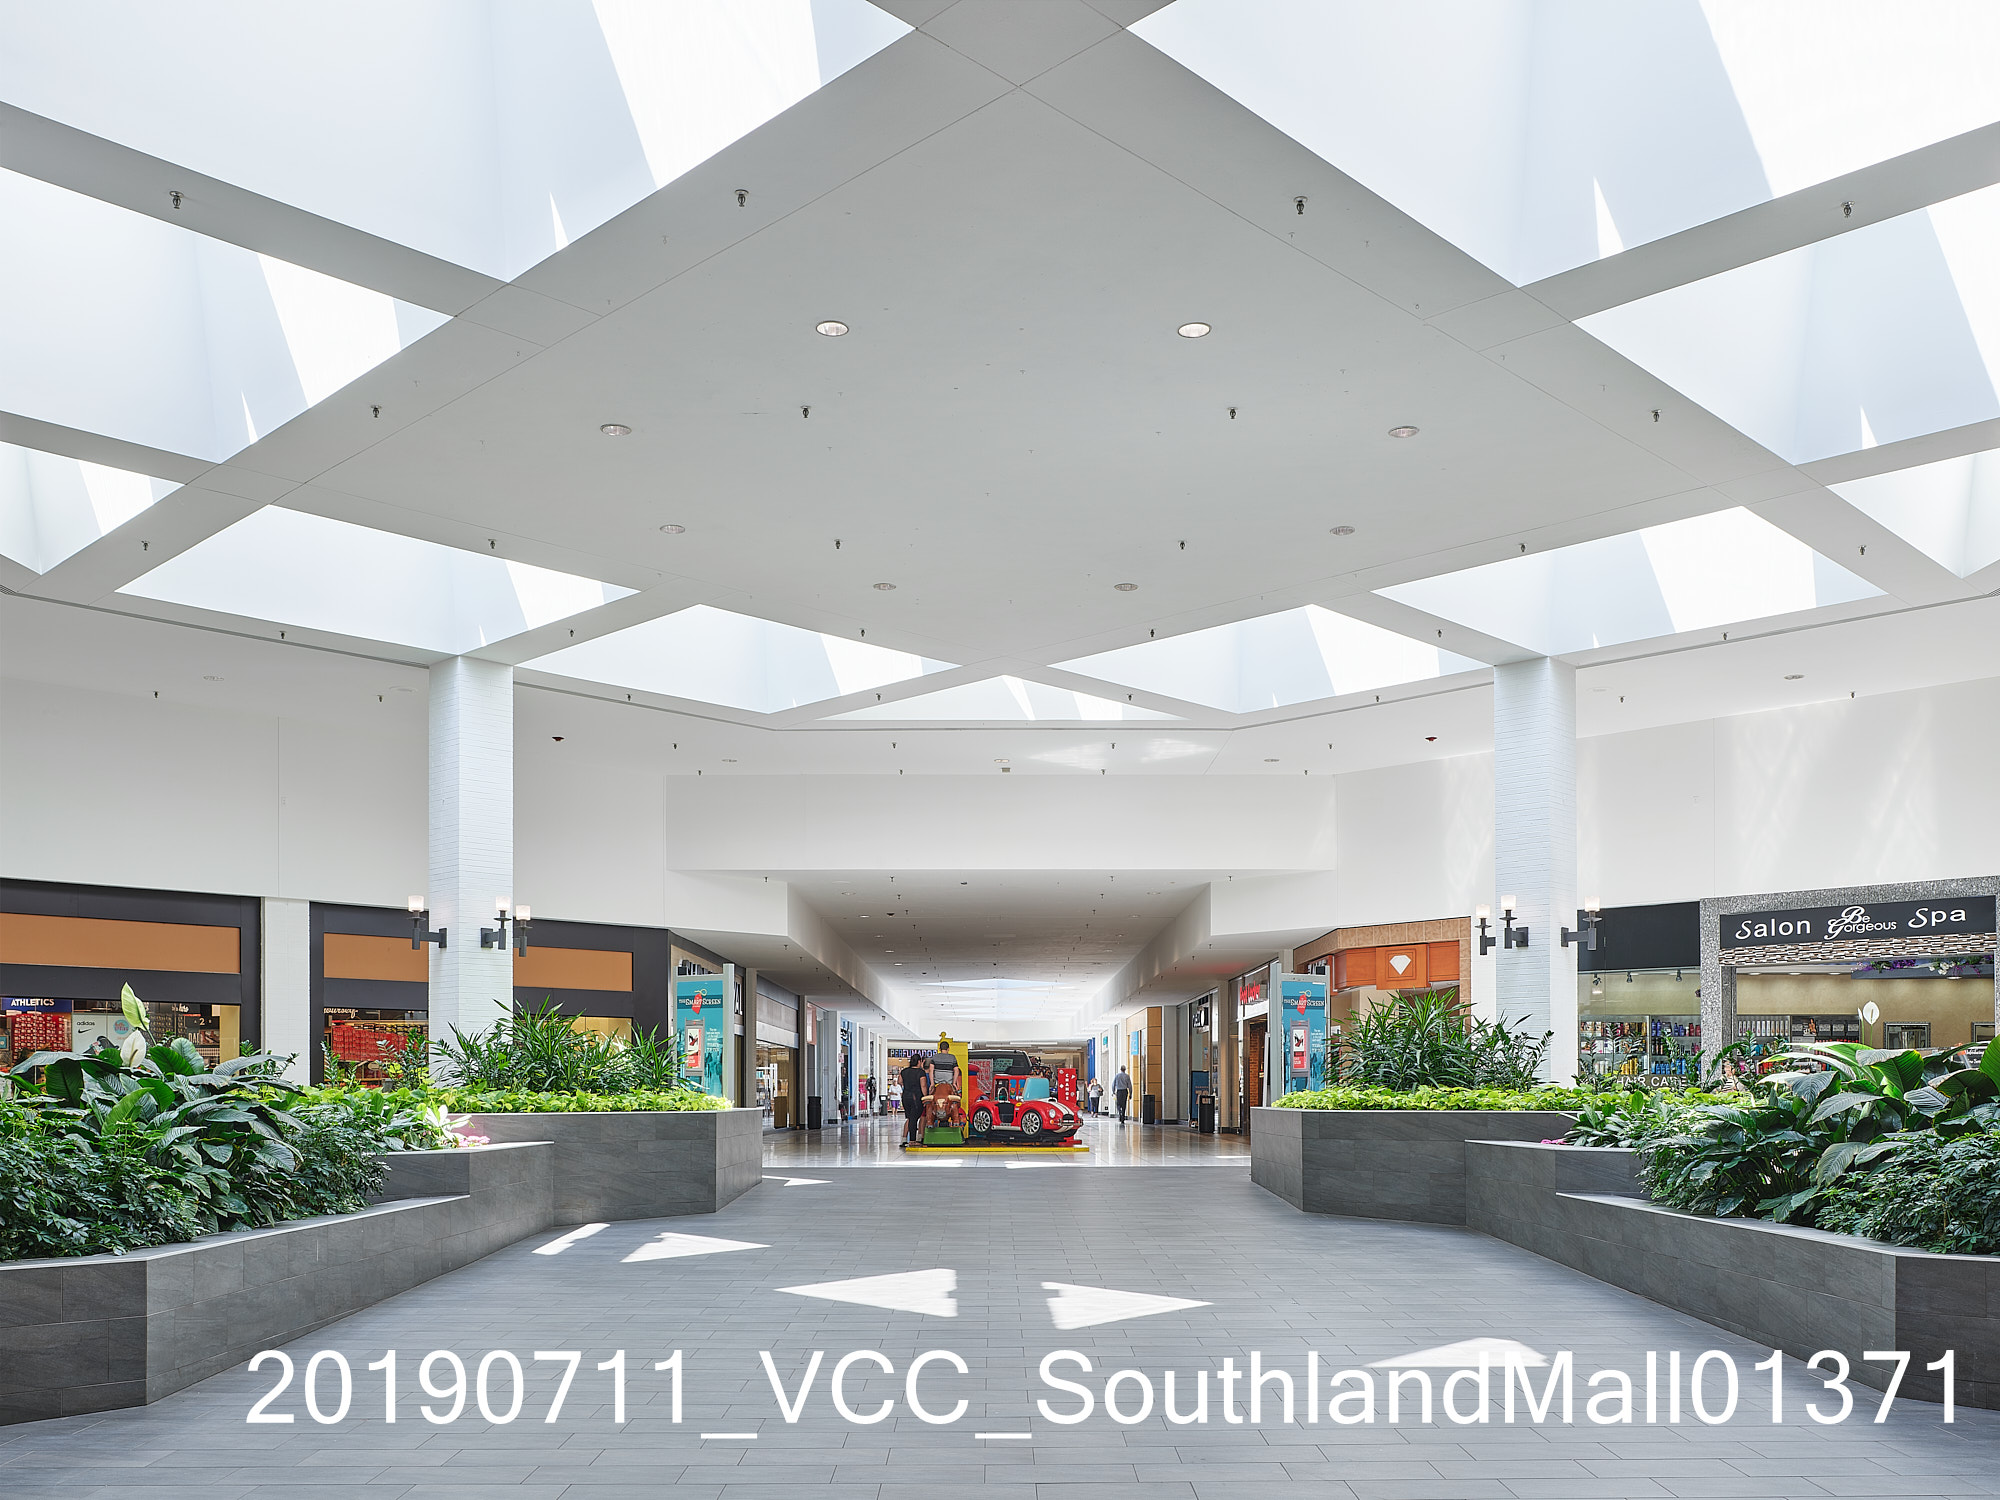 20190711_VCC_SouthlandMall01371.jpg